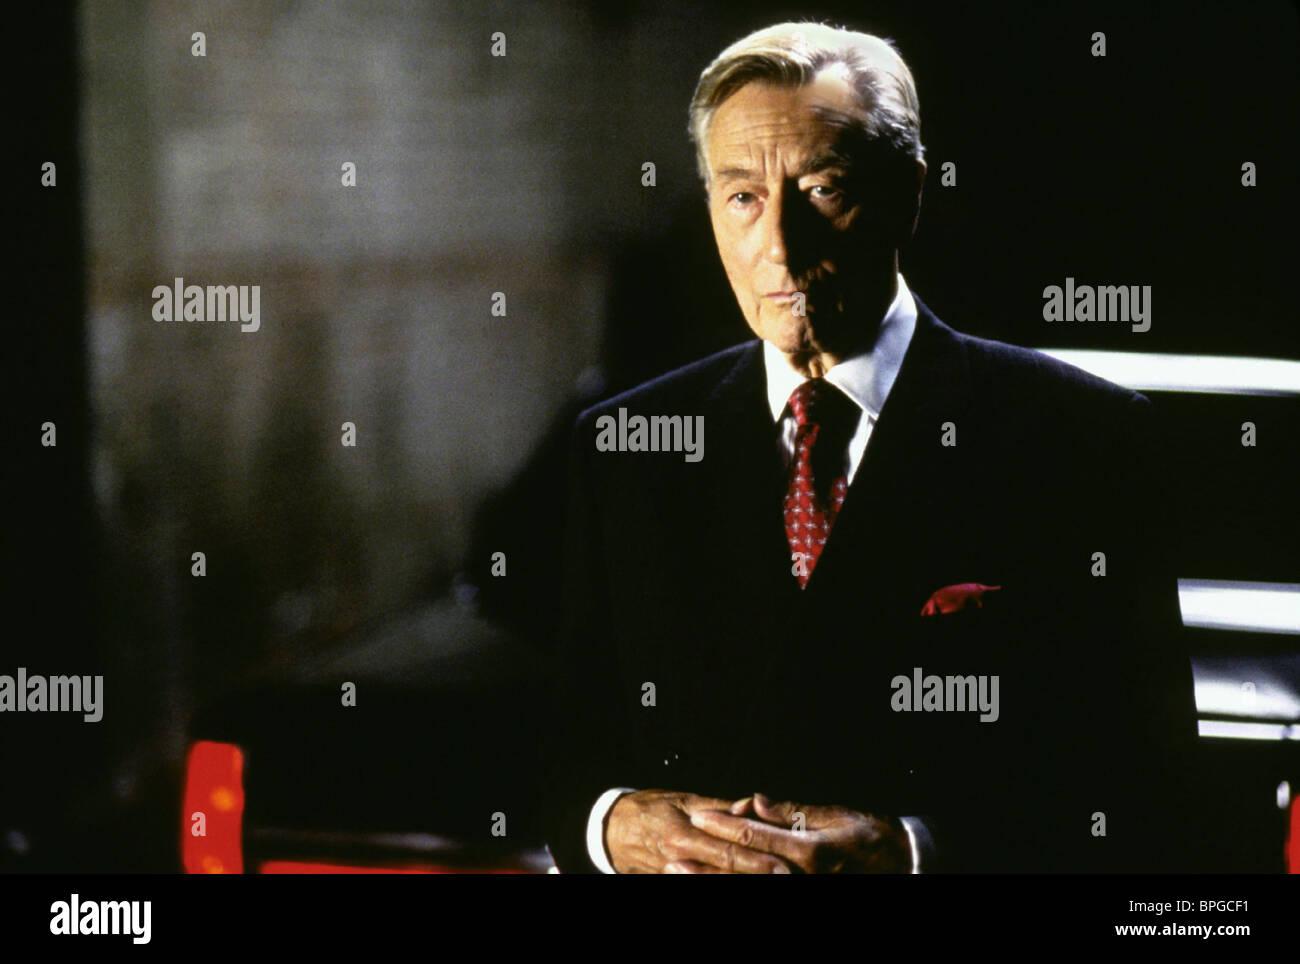 JOHN NEVILLE THE X-FILES: THE MOVIE (1998) - Stock Image